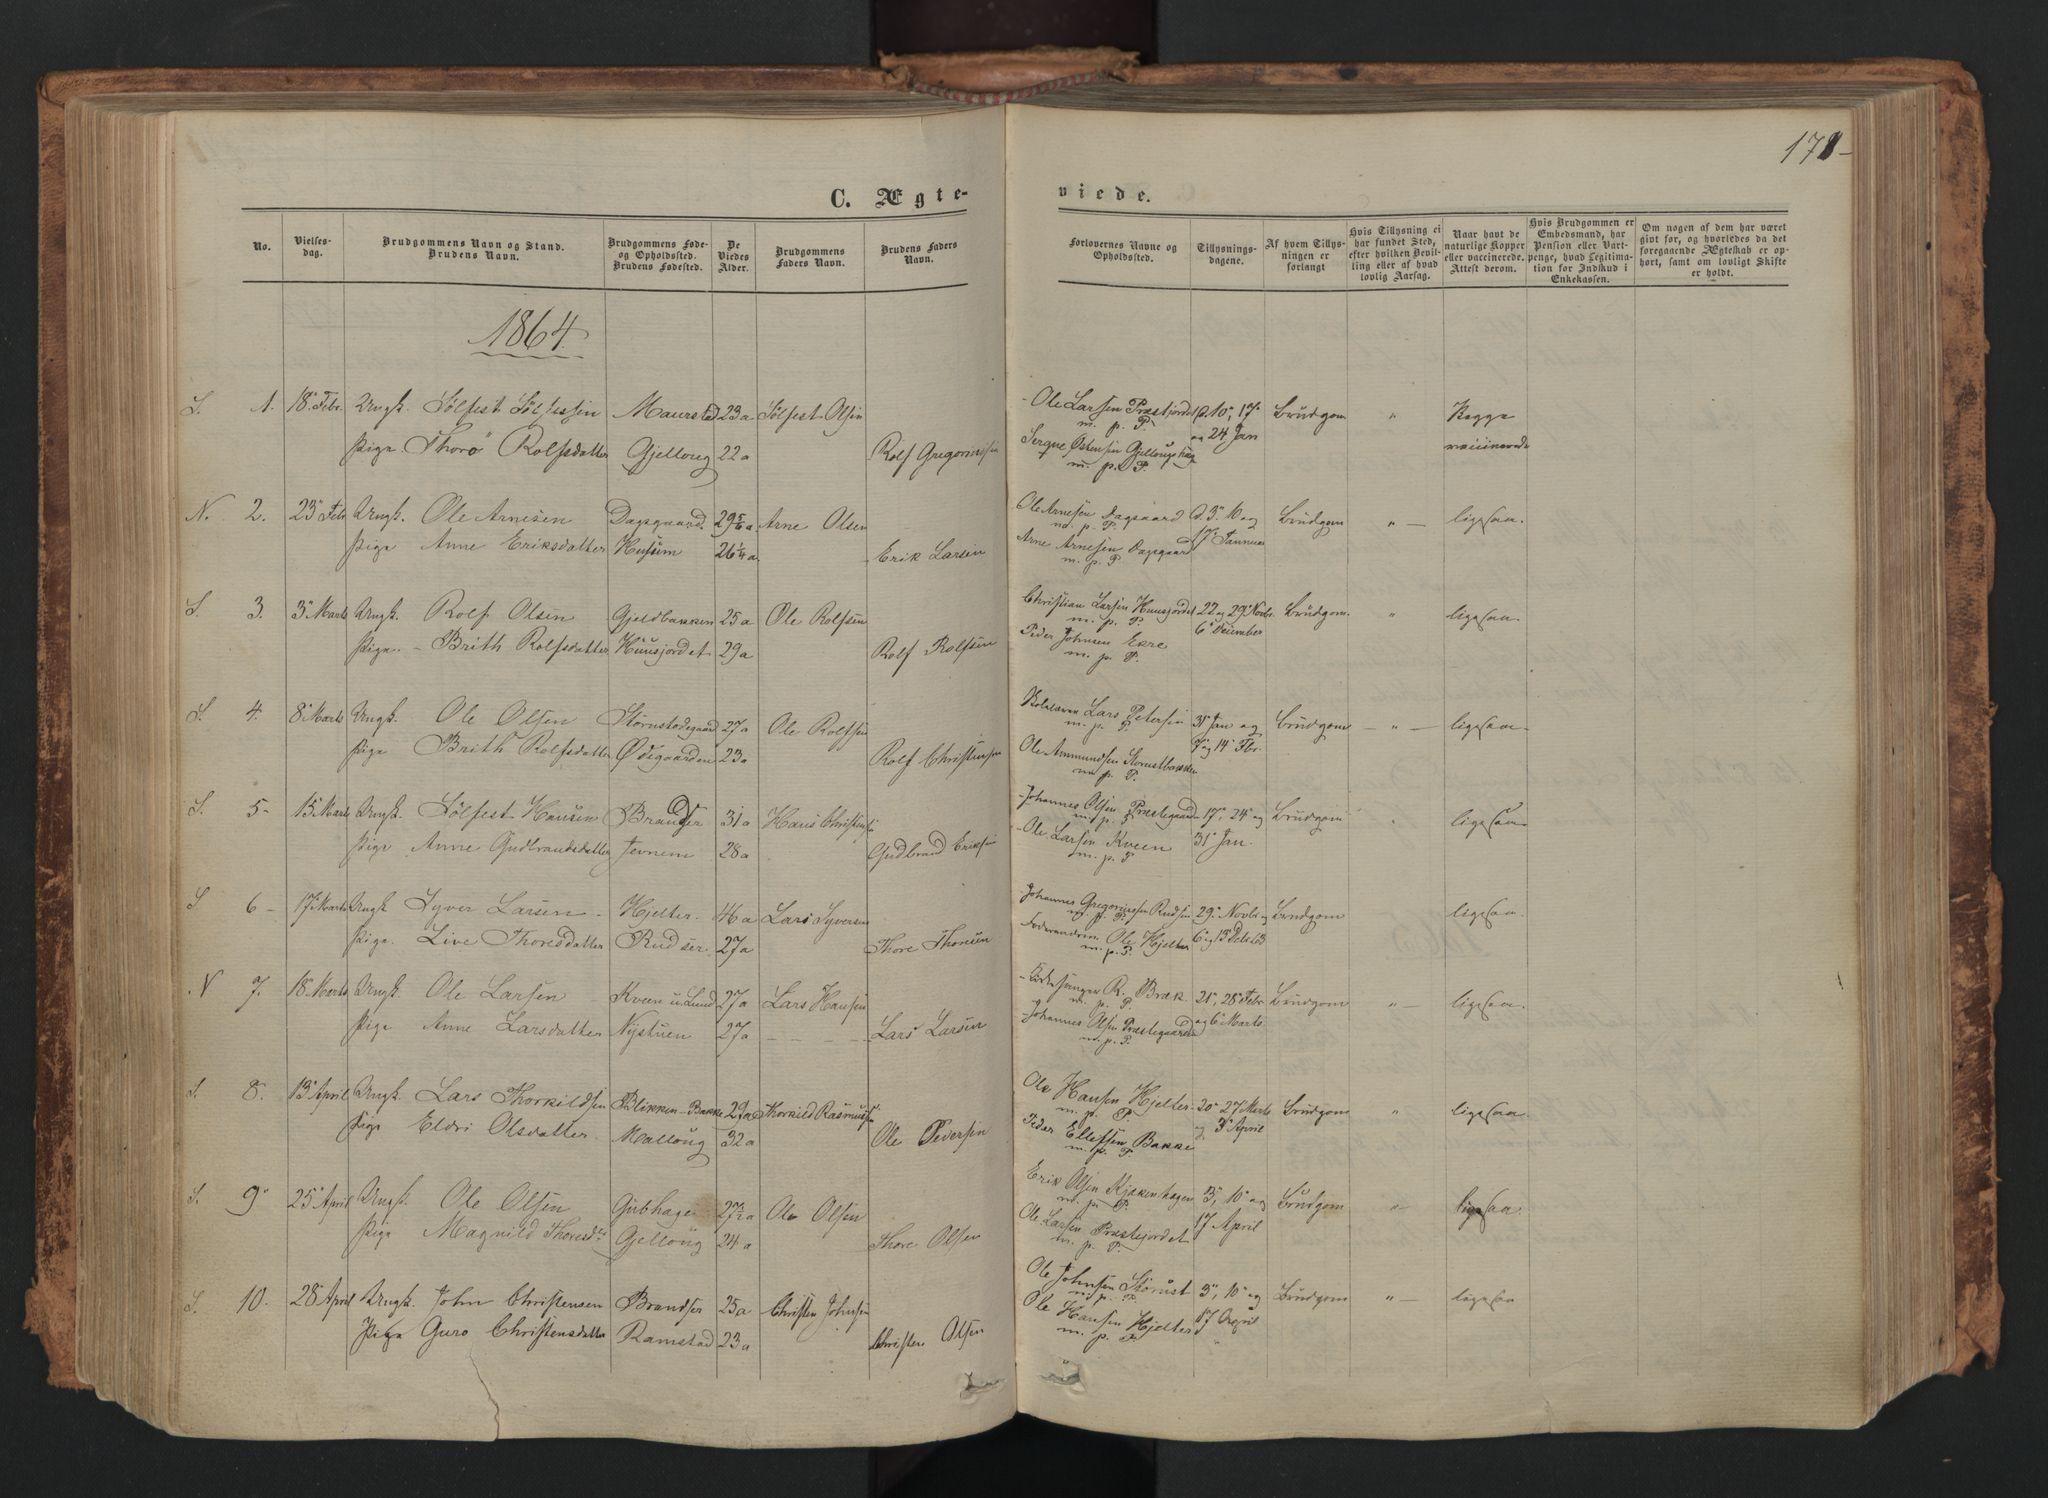 SAH, Skjåk prestekontor, Ministerialbok nr. 1, 1863-1879, s. 171